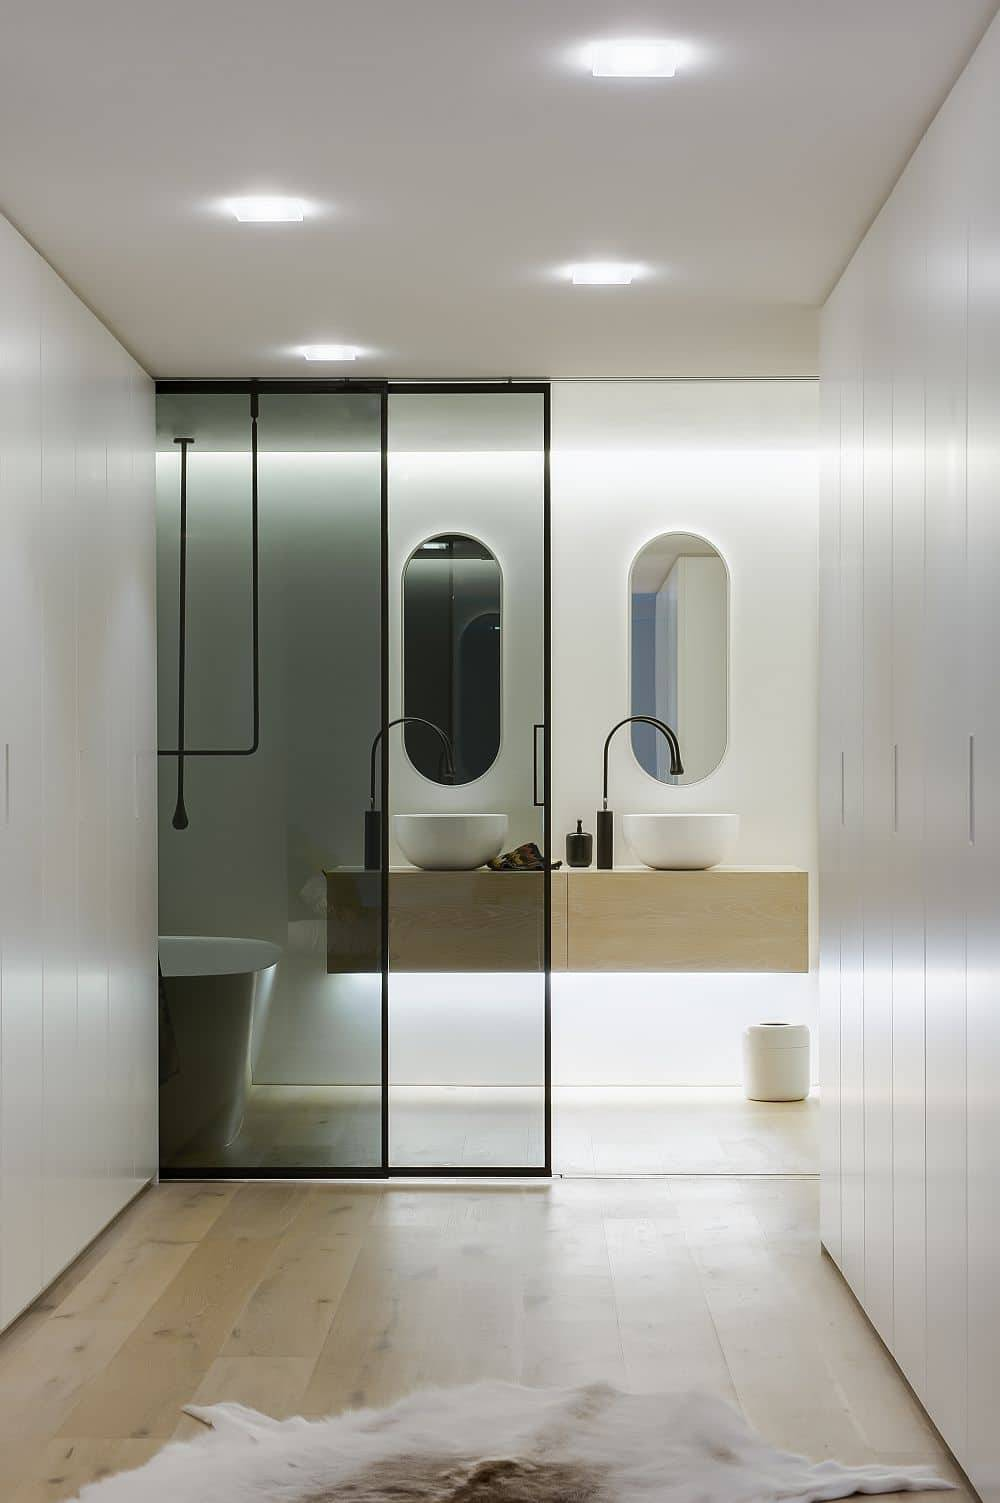 velaria schuifdeur in rookglas badkamer